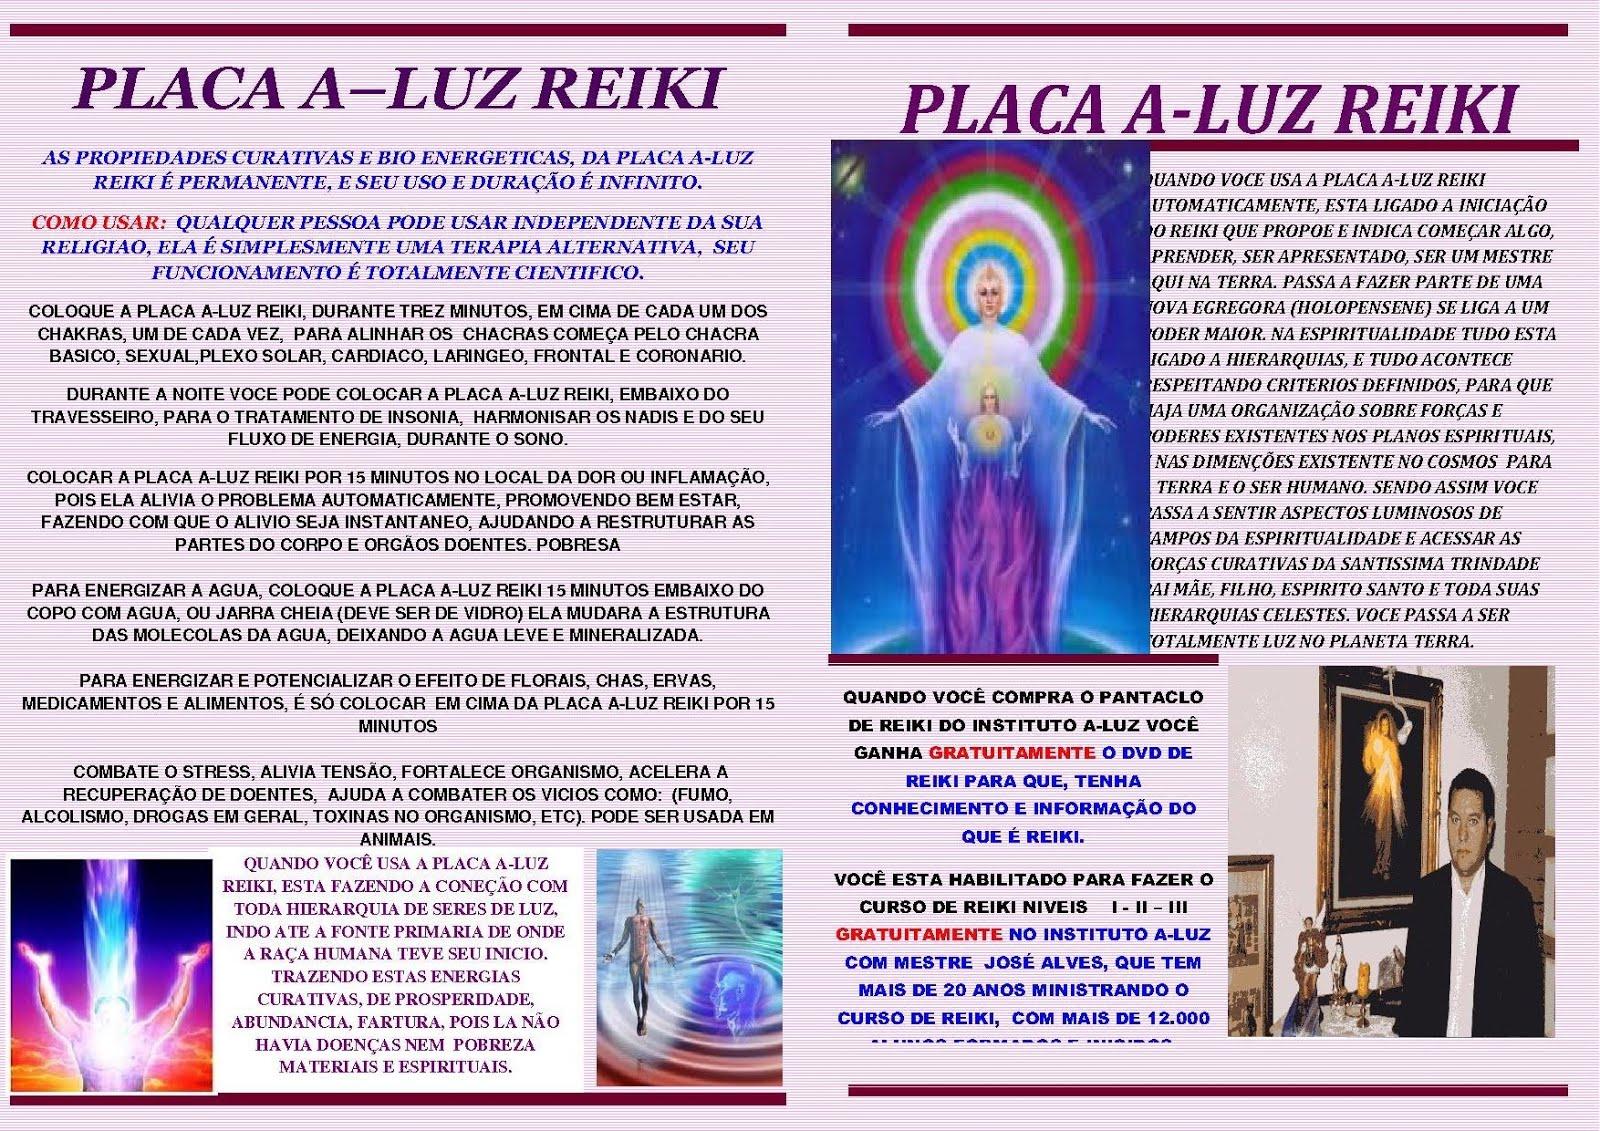 PLACA A-LUZ 01